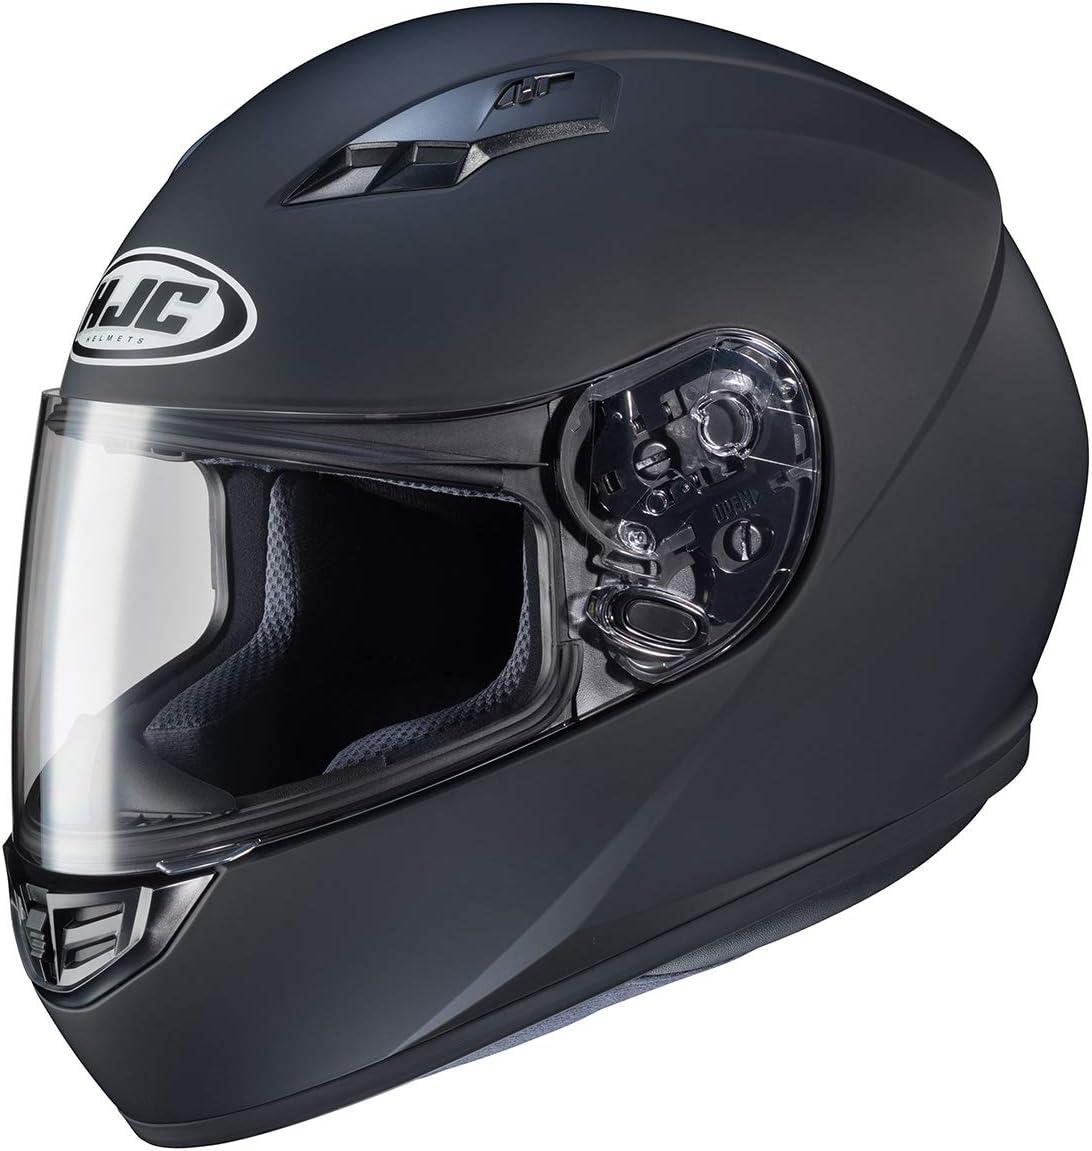 HJC Helmets 130-615 CS-R3 Unisex-Adult Full Face Matte Motorcycle Helmet (Matte Black, X-Large)